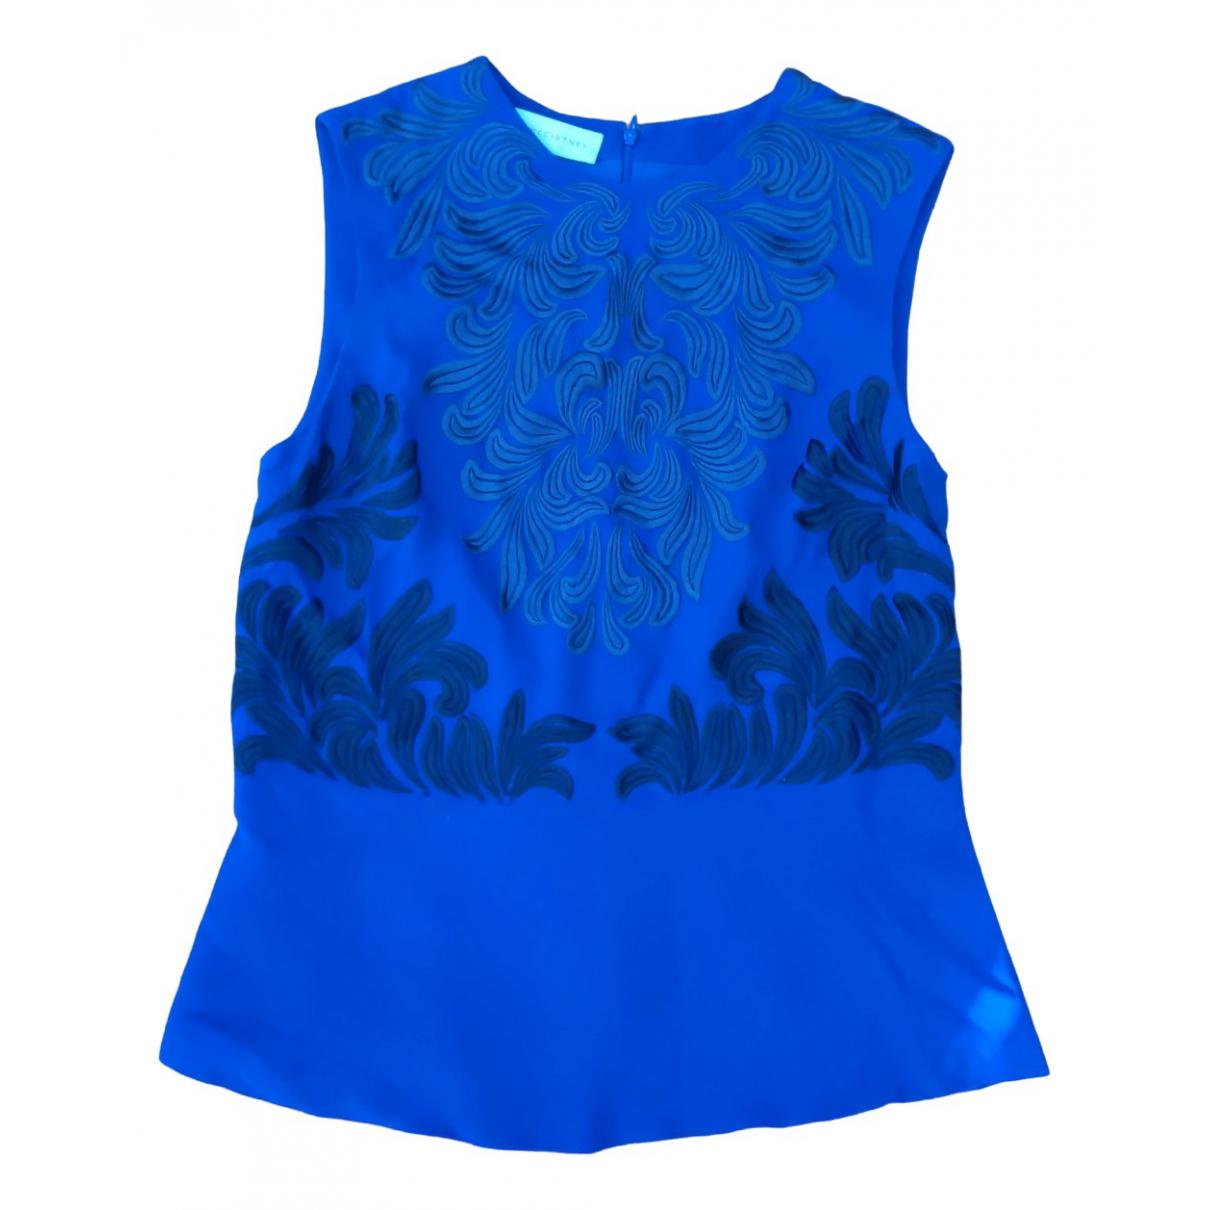 Stella Mccartney - Top   pour femme - bleu